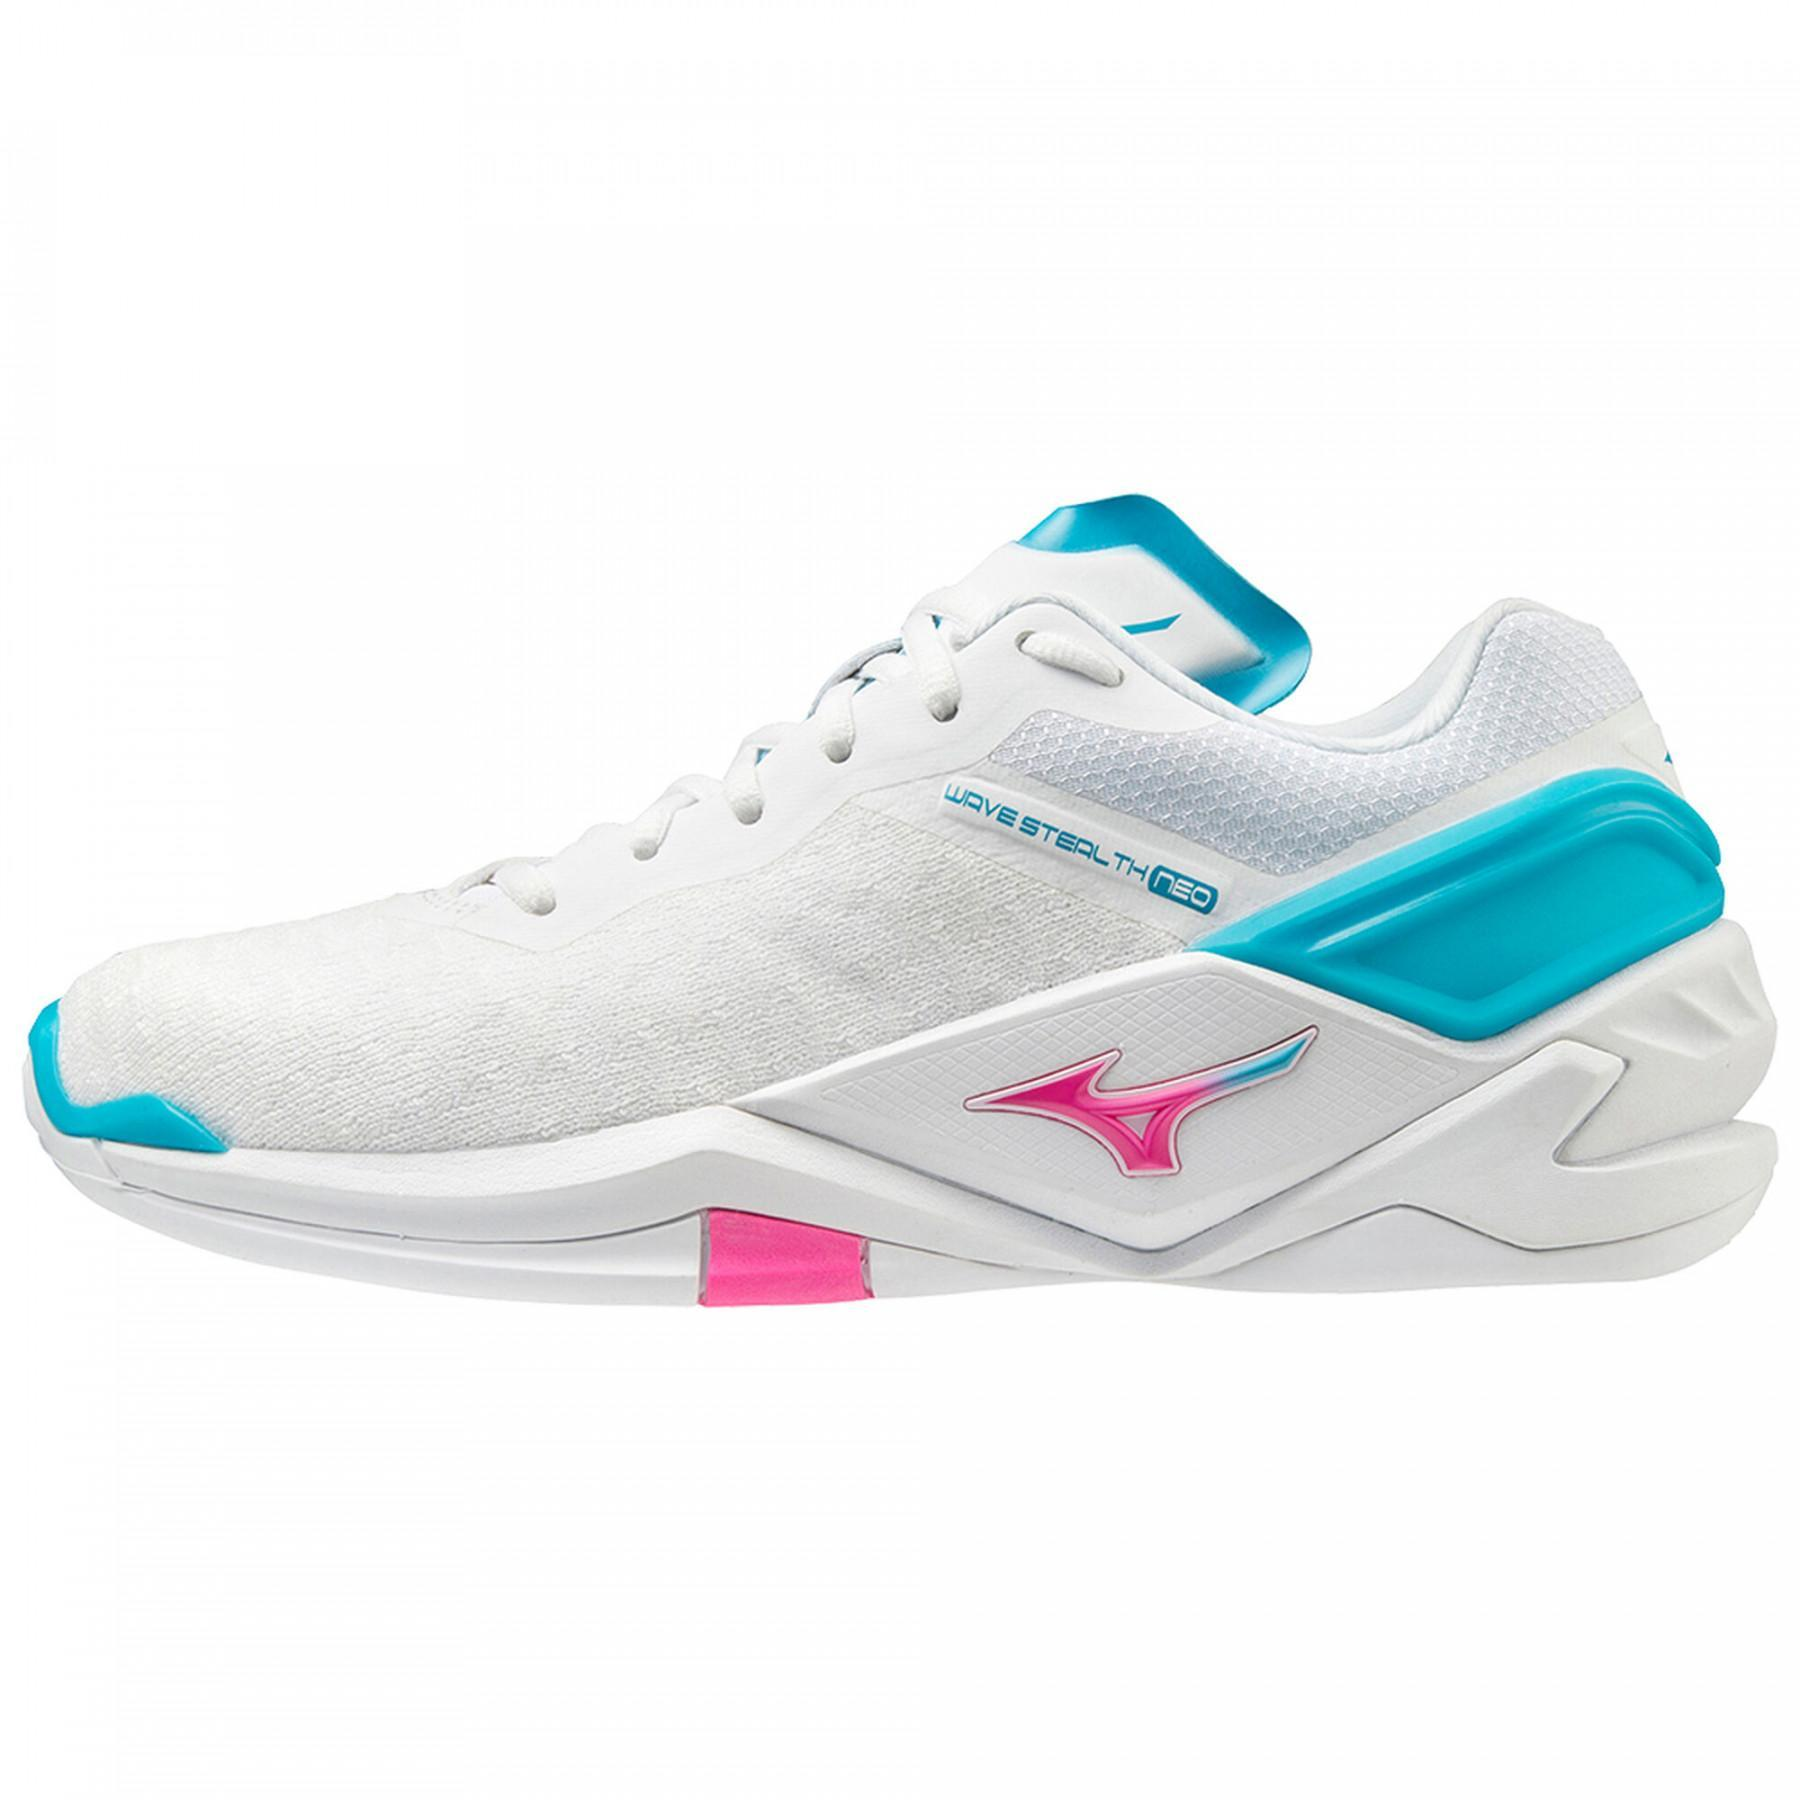 Women's shoes Mizuno Wave Stealth Neo